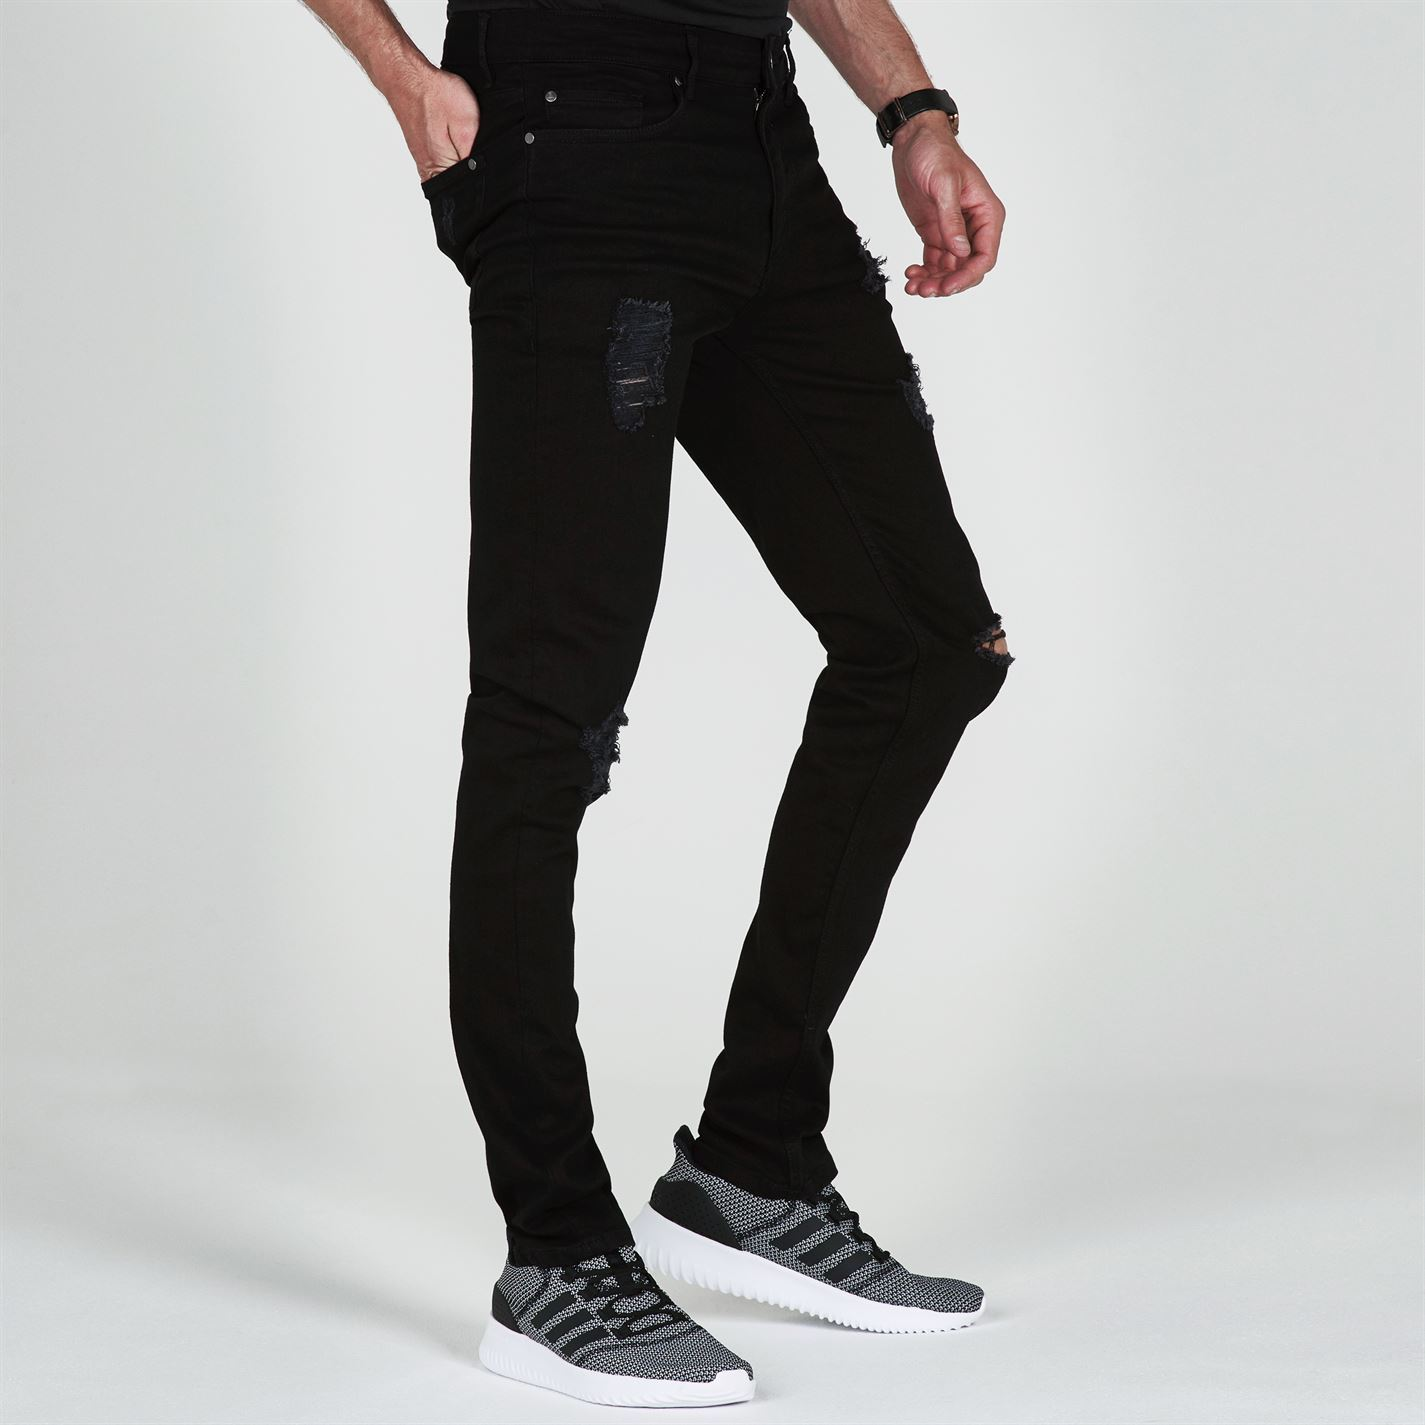 Jeans-Denim-Firetrap-Skinny-Mens-Trouser-Pants-Black thumbnail 11